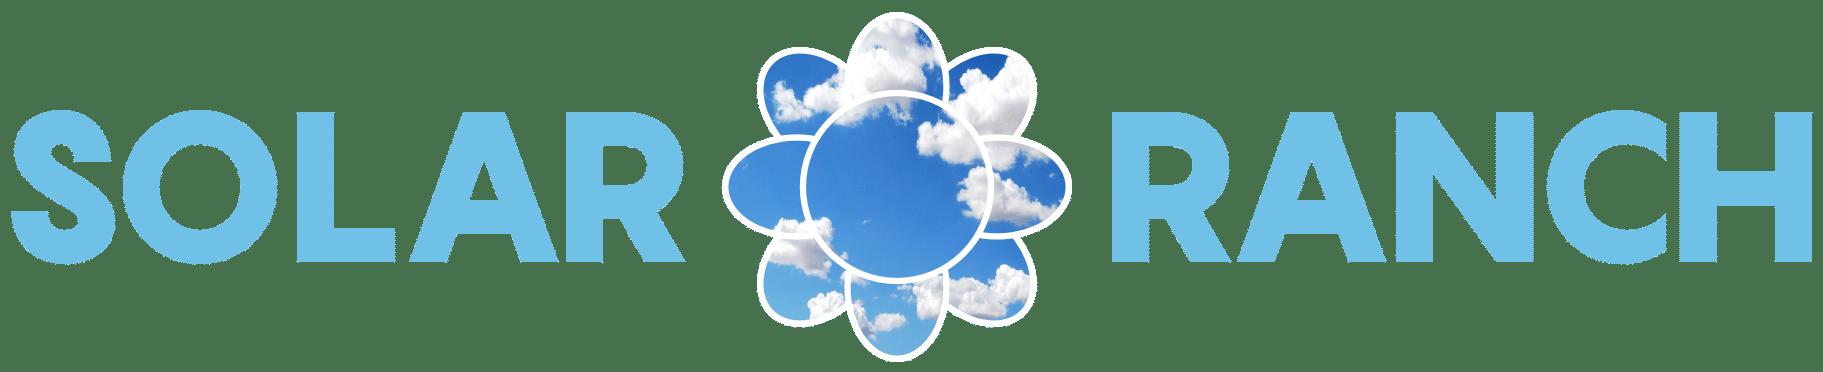 Solarranch Webshop